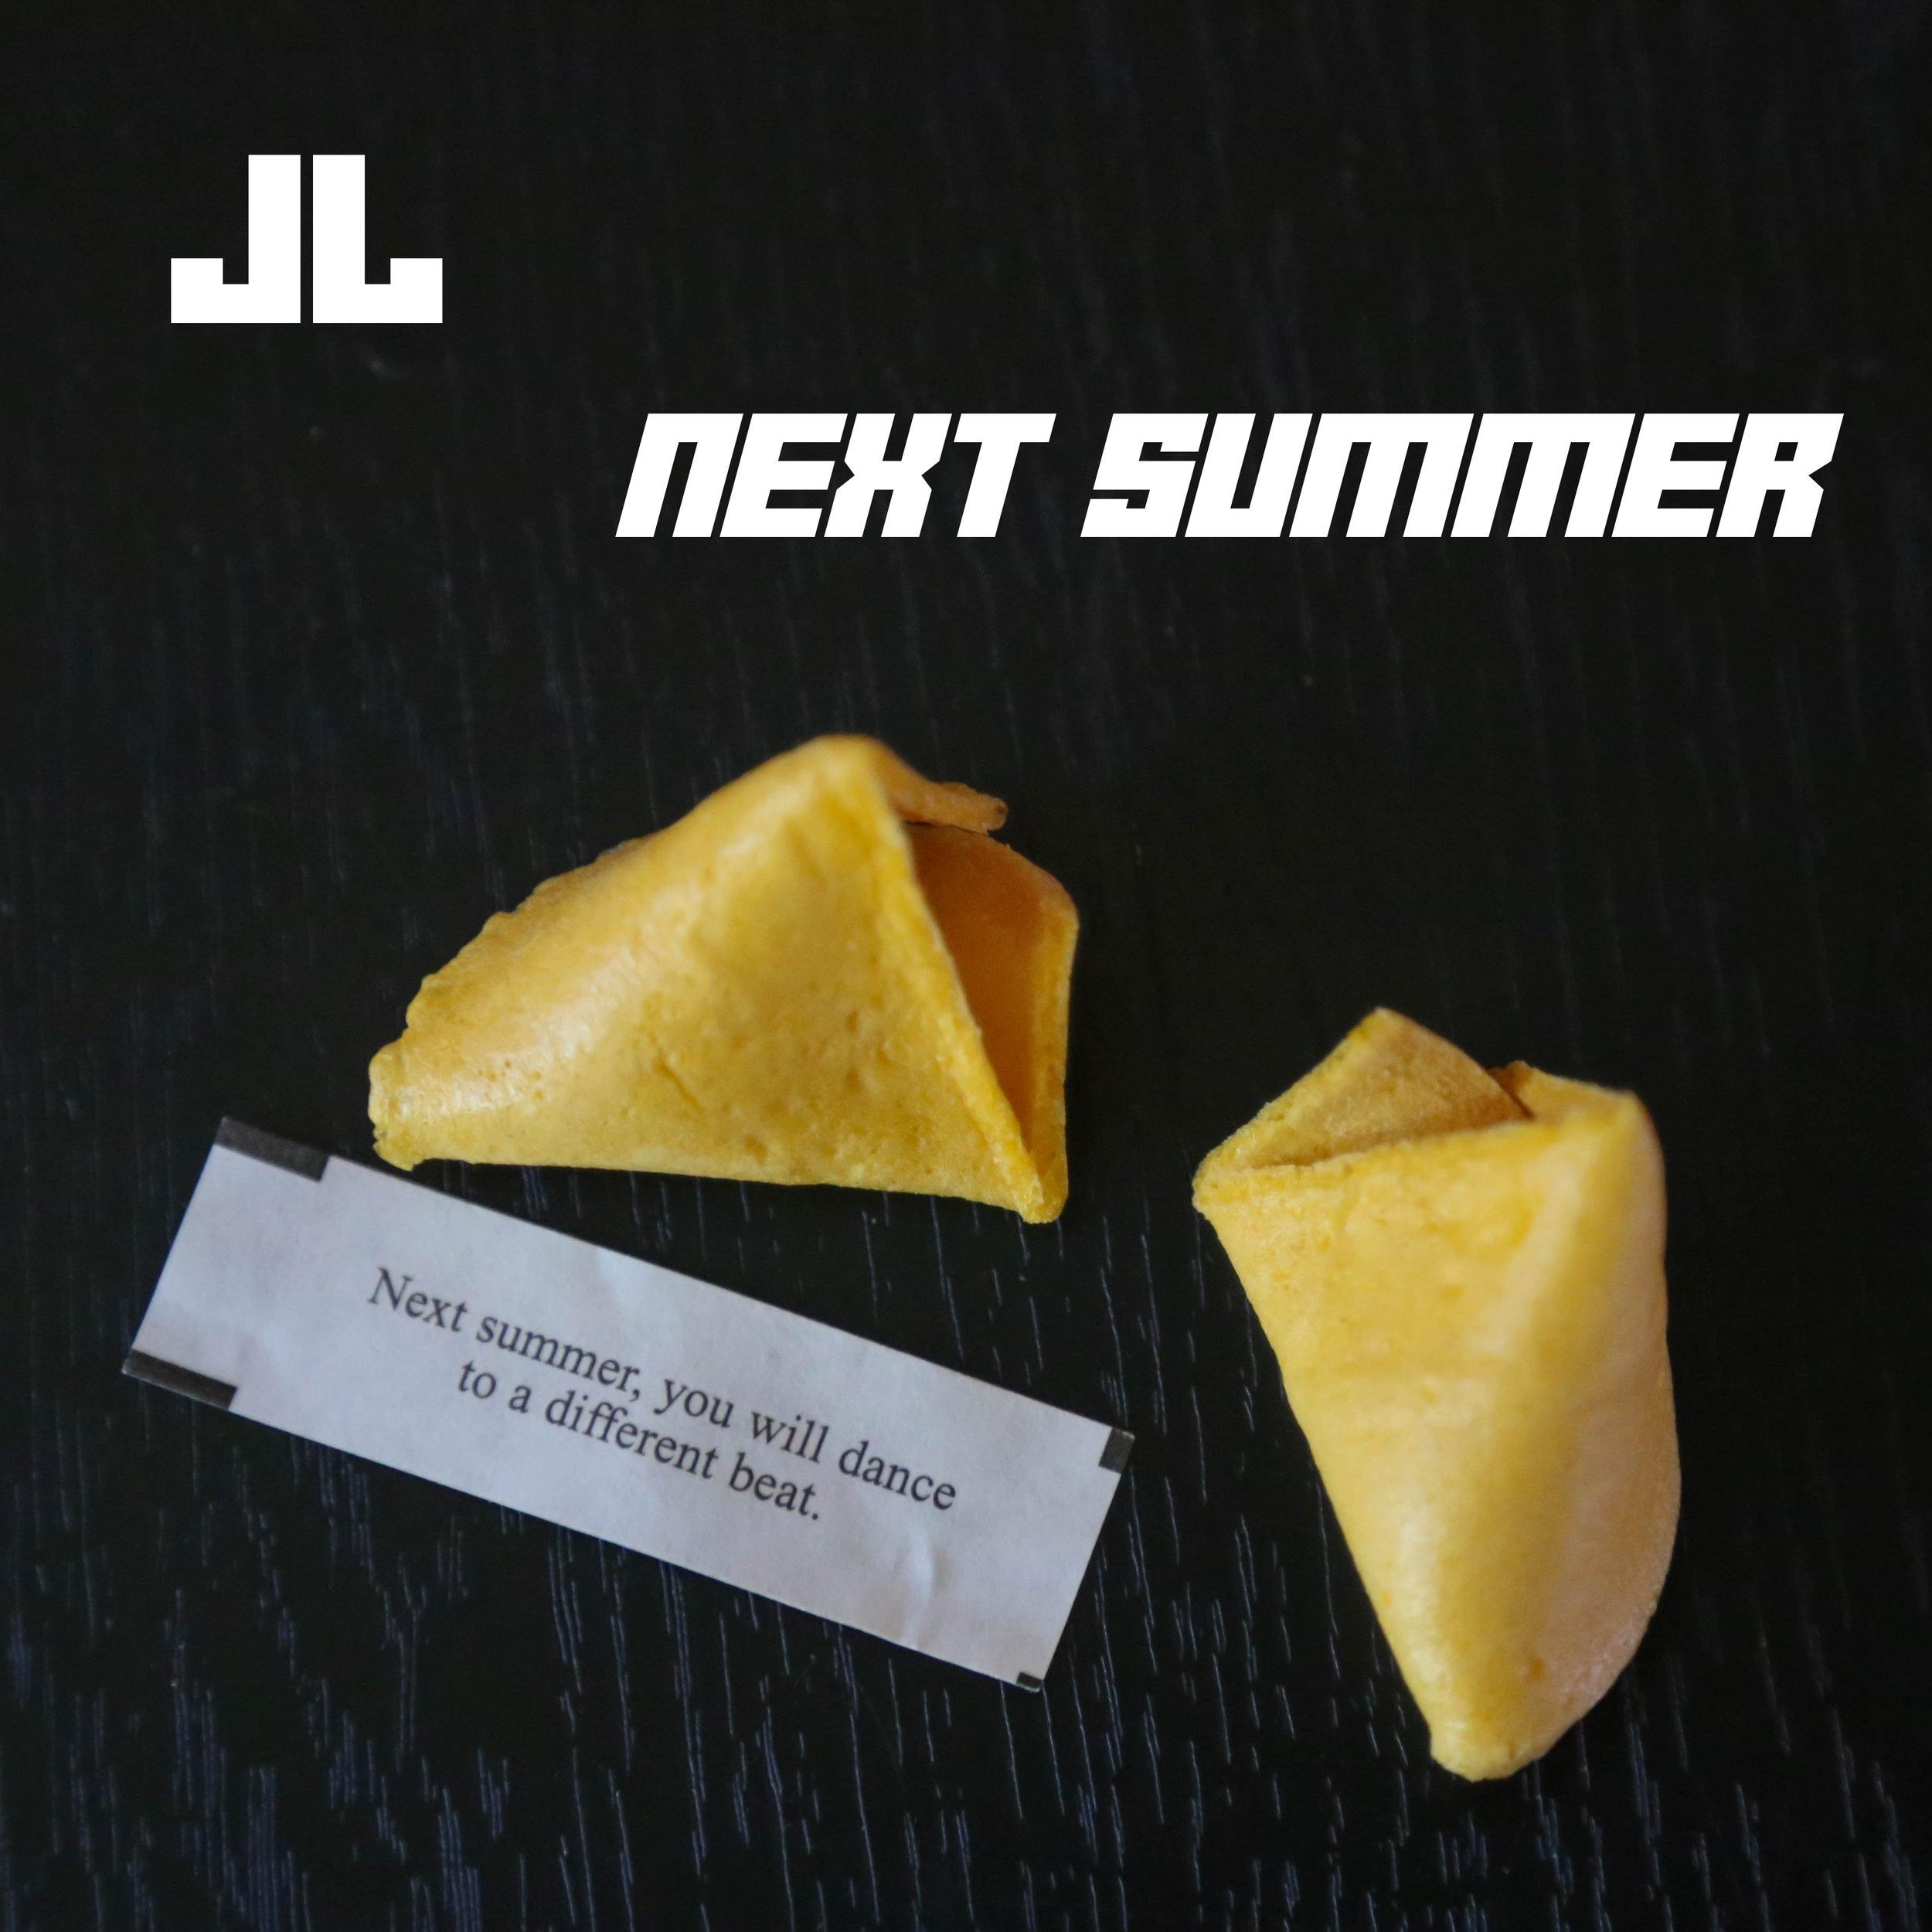 Next Summer - by jl